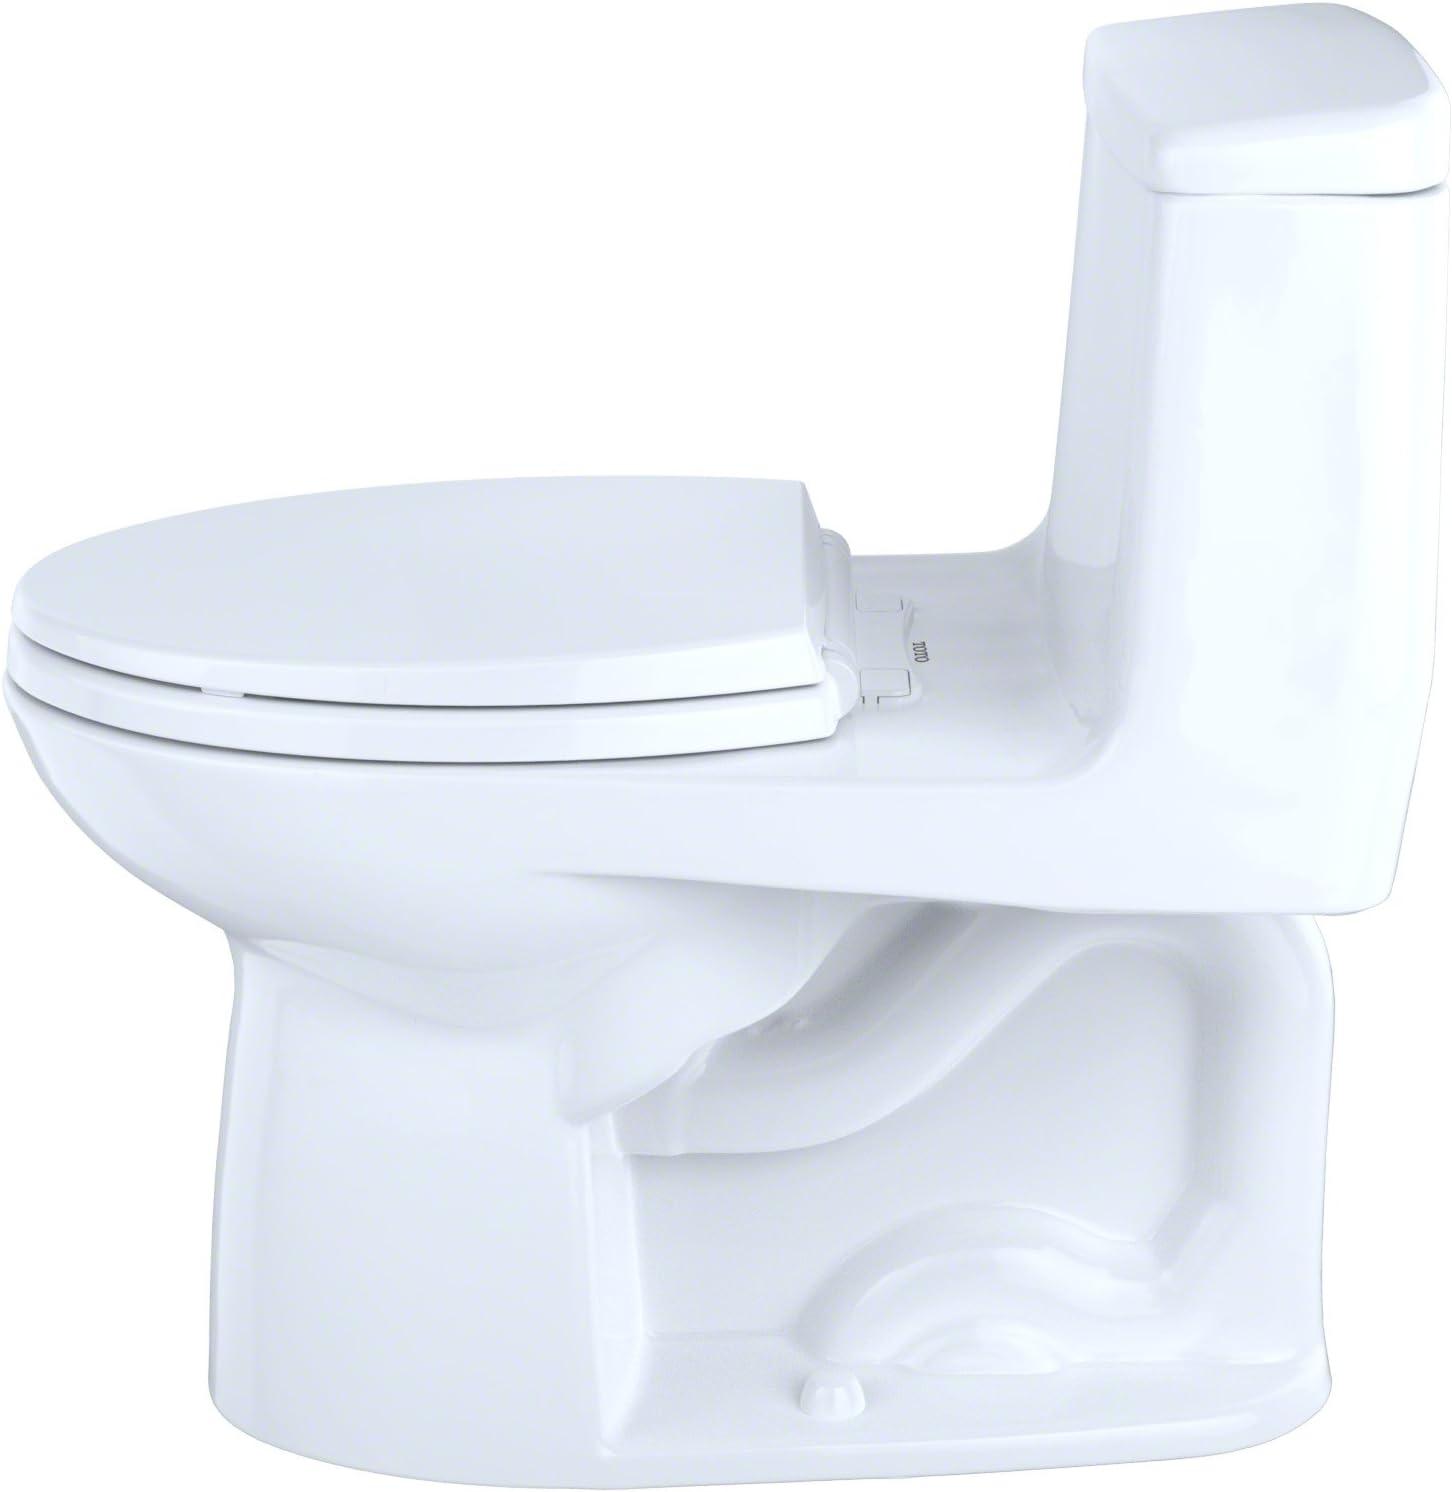 TOTO MS854114E#01 Eco Ultramax Elongated One Piece Toilet, Cotton White - -